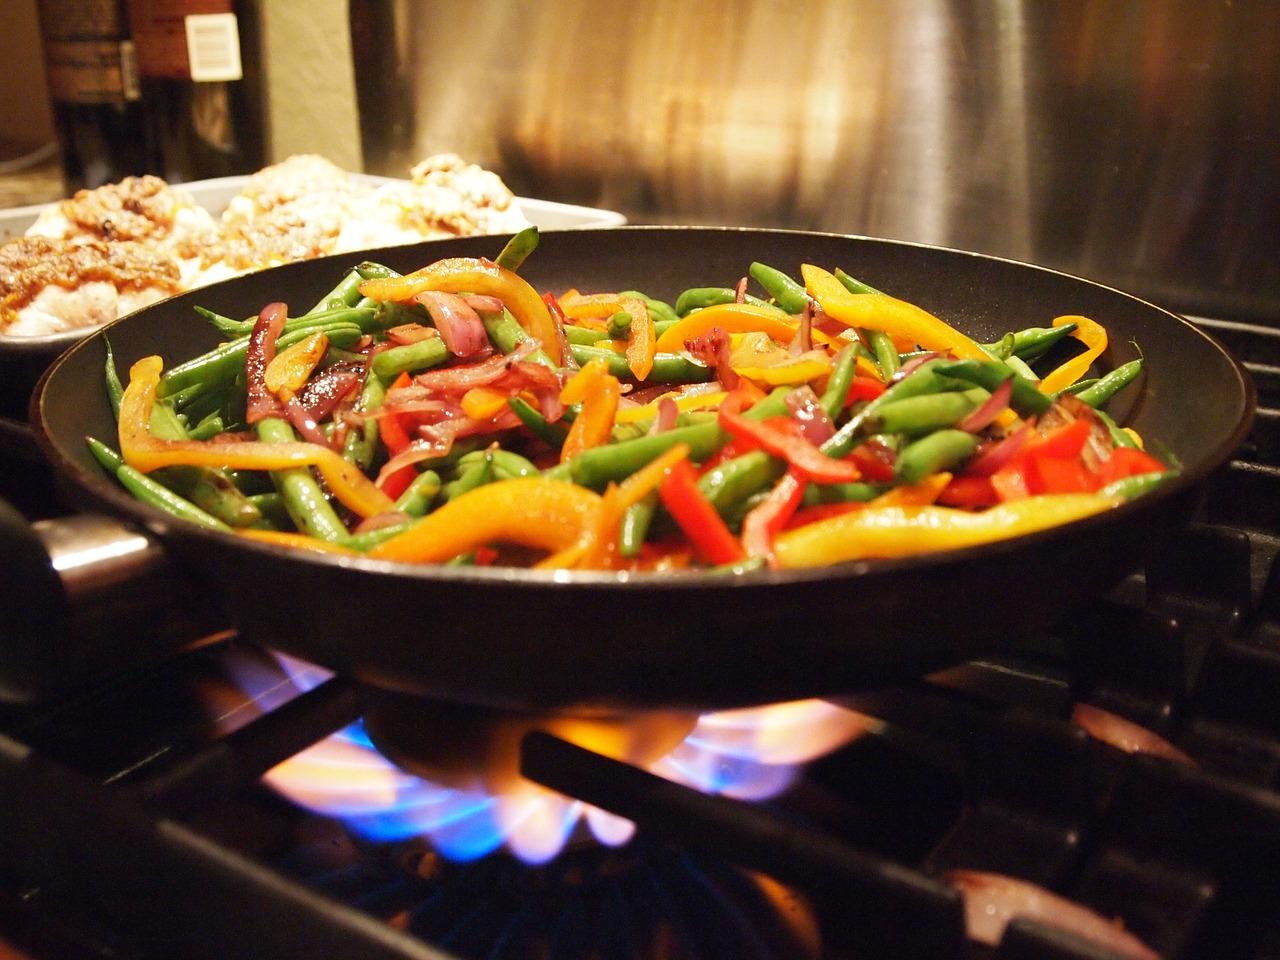 healthy frying of food